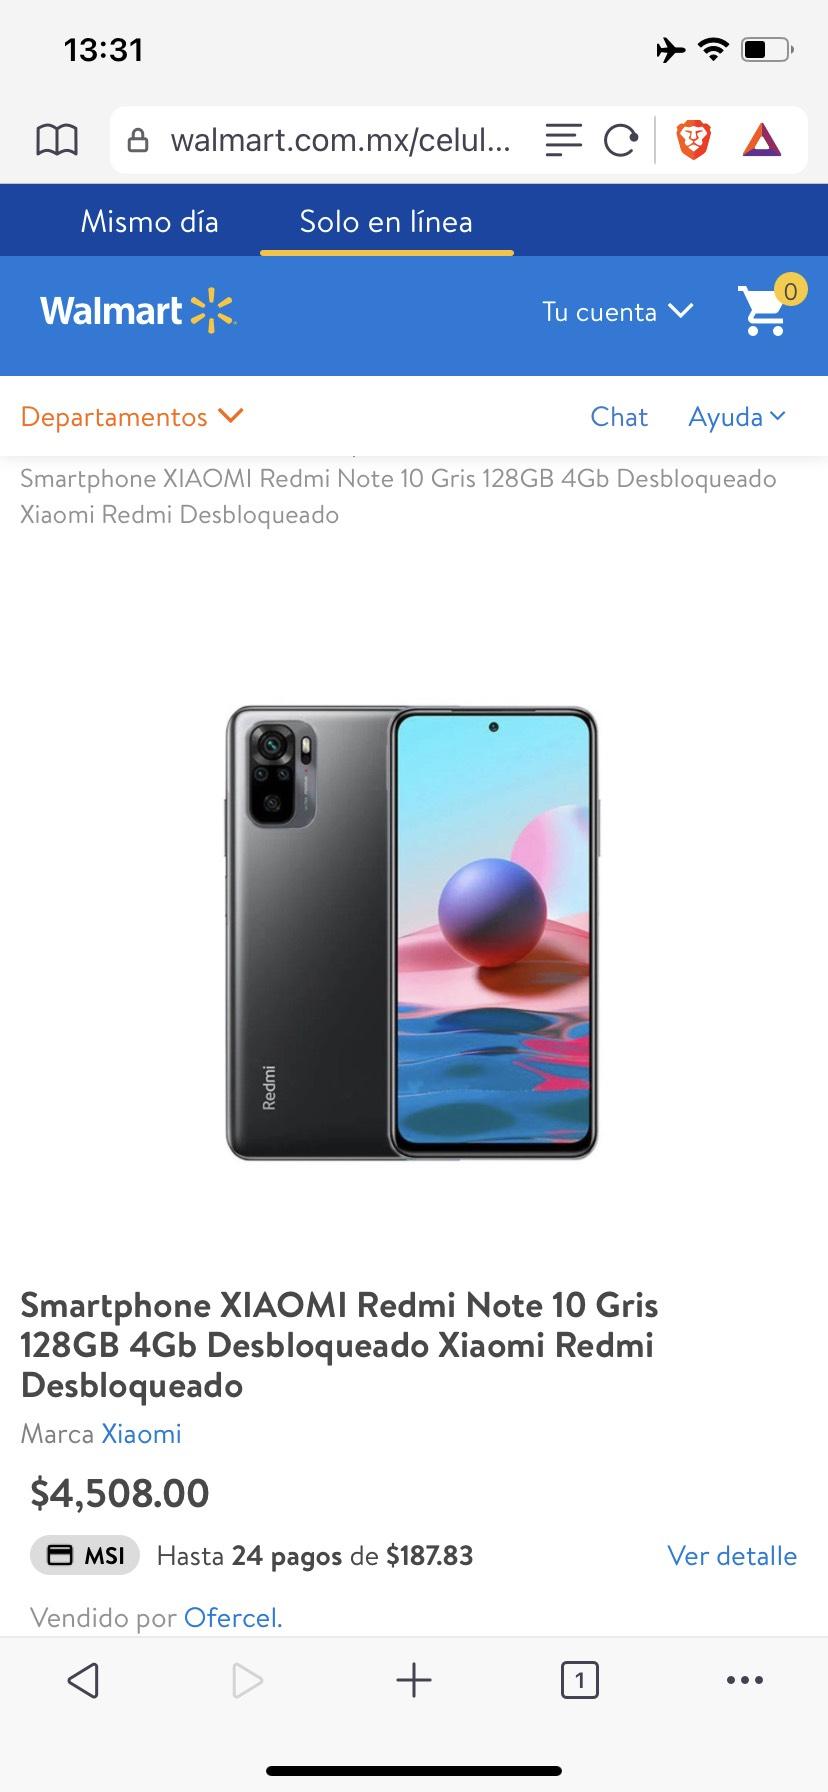 Walmart: Xiaomi Redmi Note 10 Gris 4/128 gb Desbloqueado